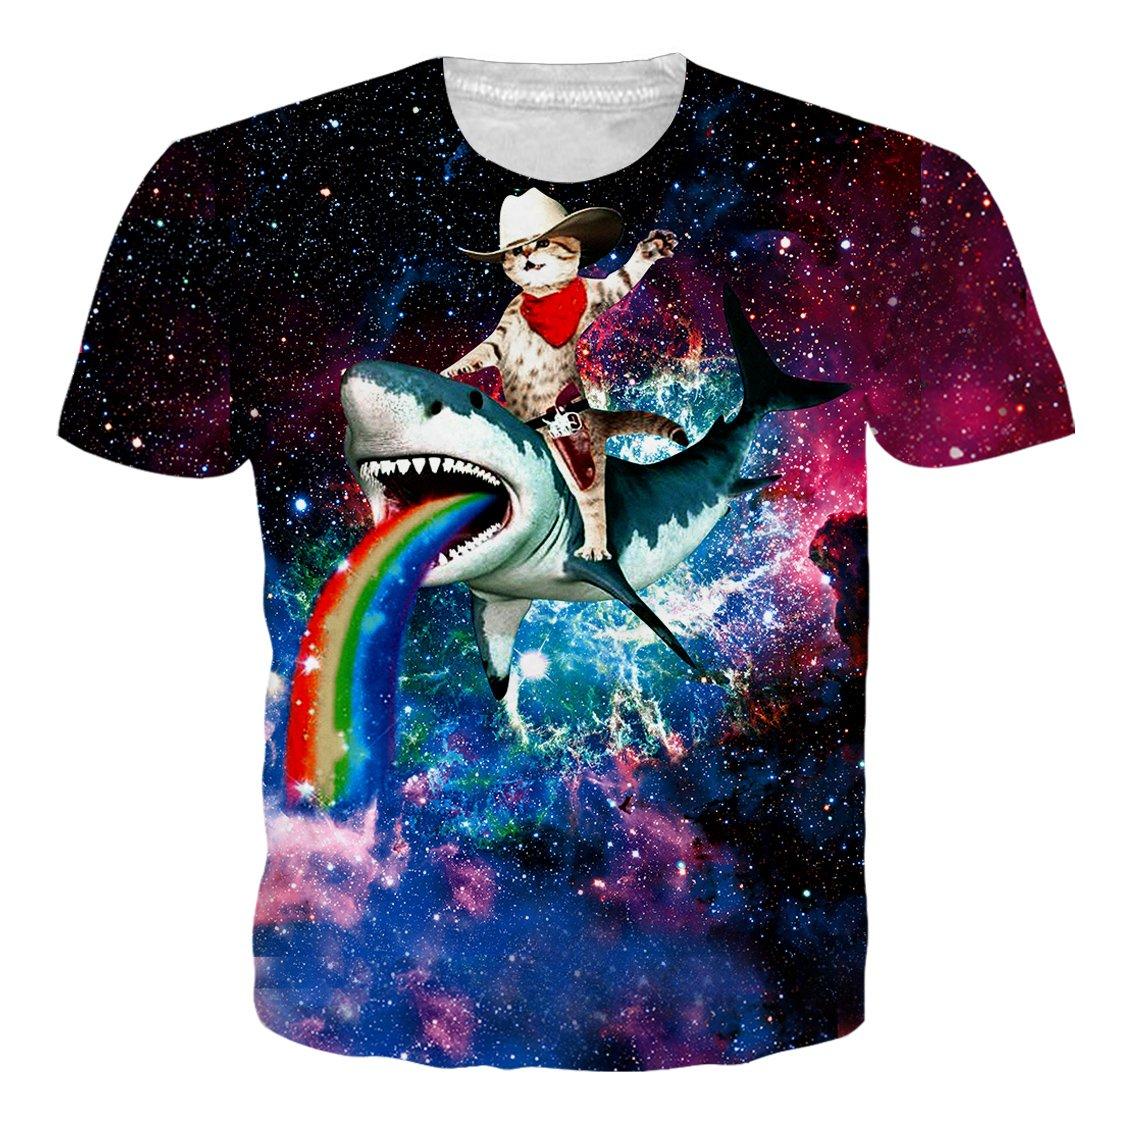 RAISEVERN Unisex 3D Creative Galaxy Printed Short Sleeve T-Shirts Tees